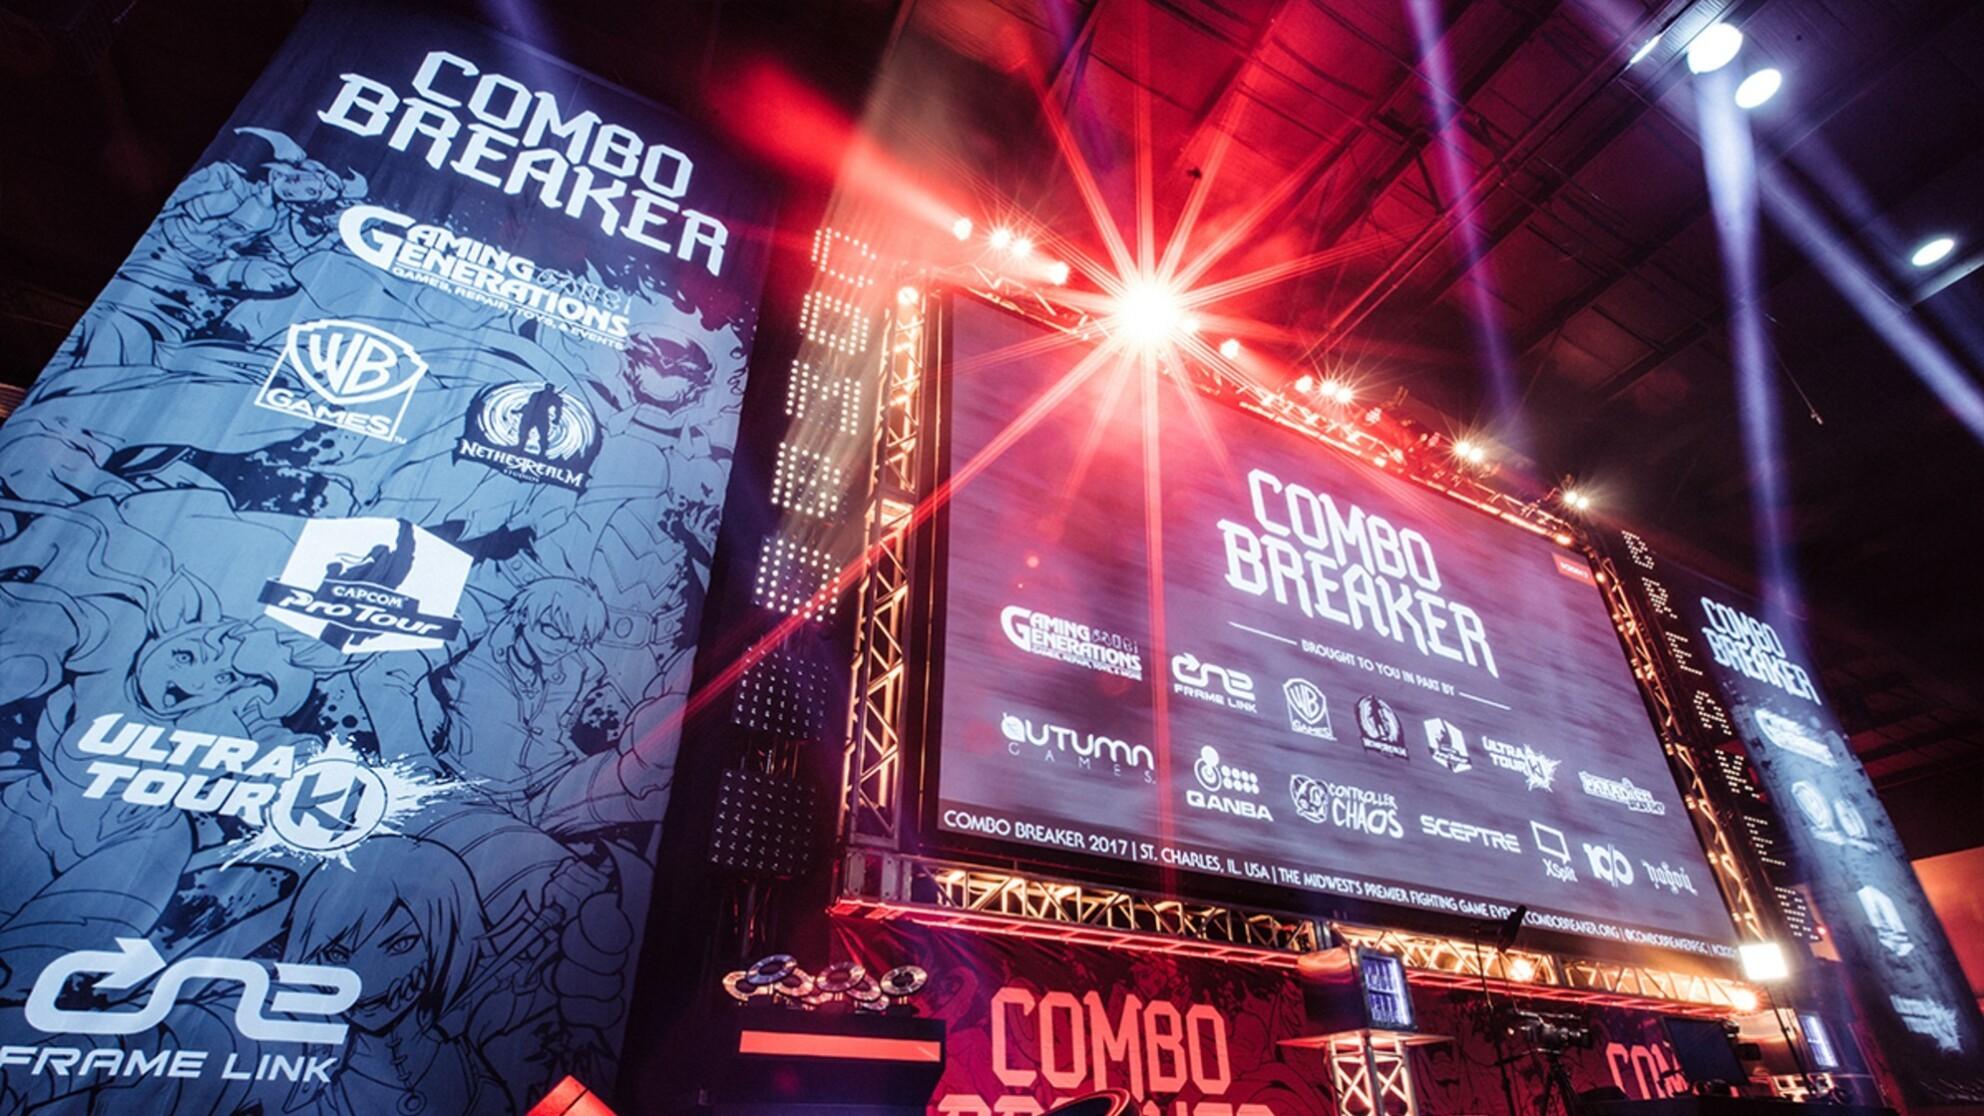 Combo Breaker 2020 announce tournament details